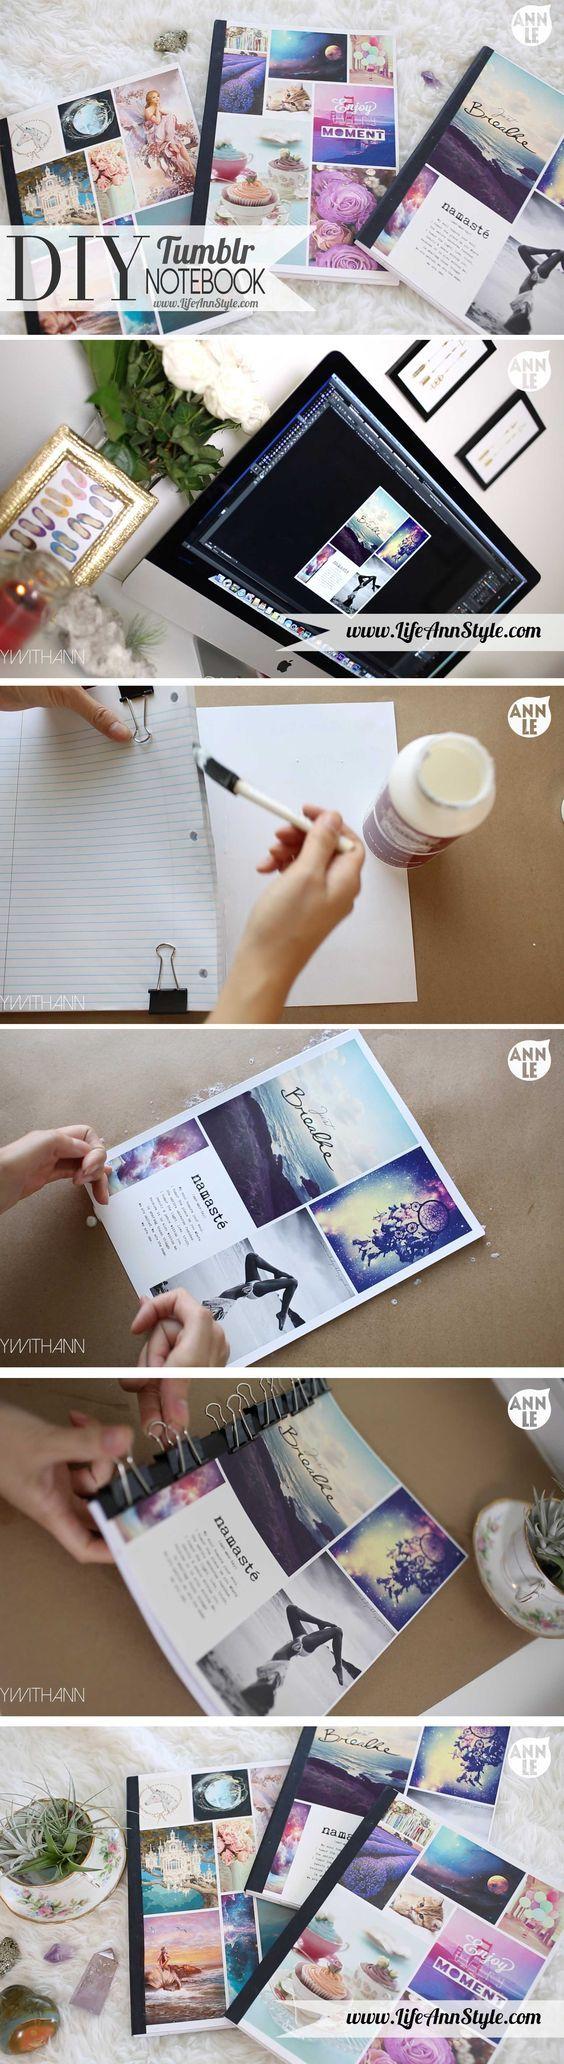 cuaderno collage